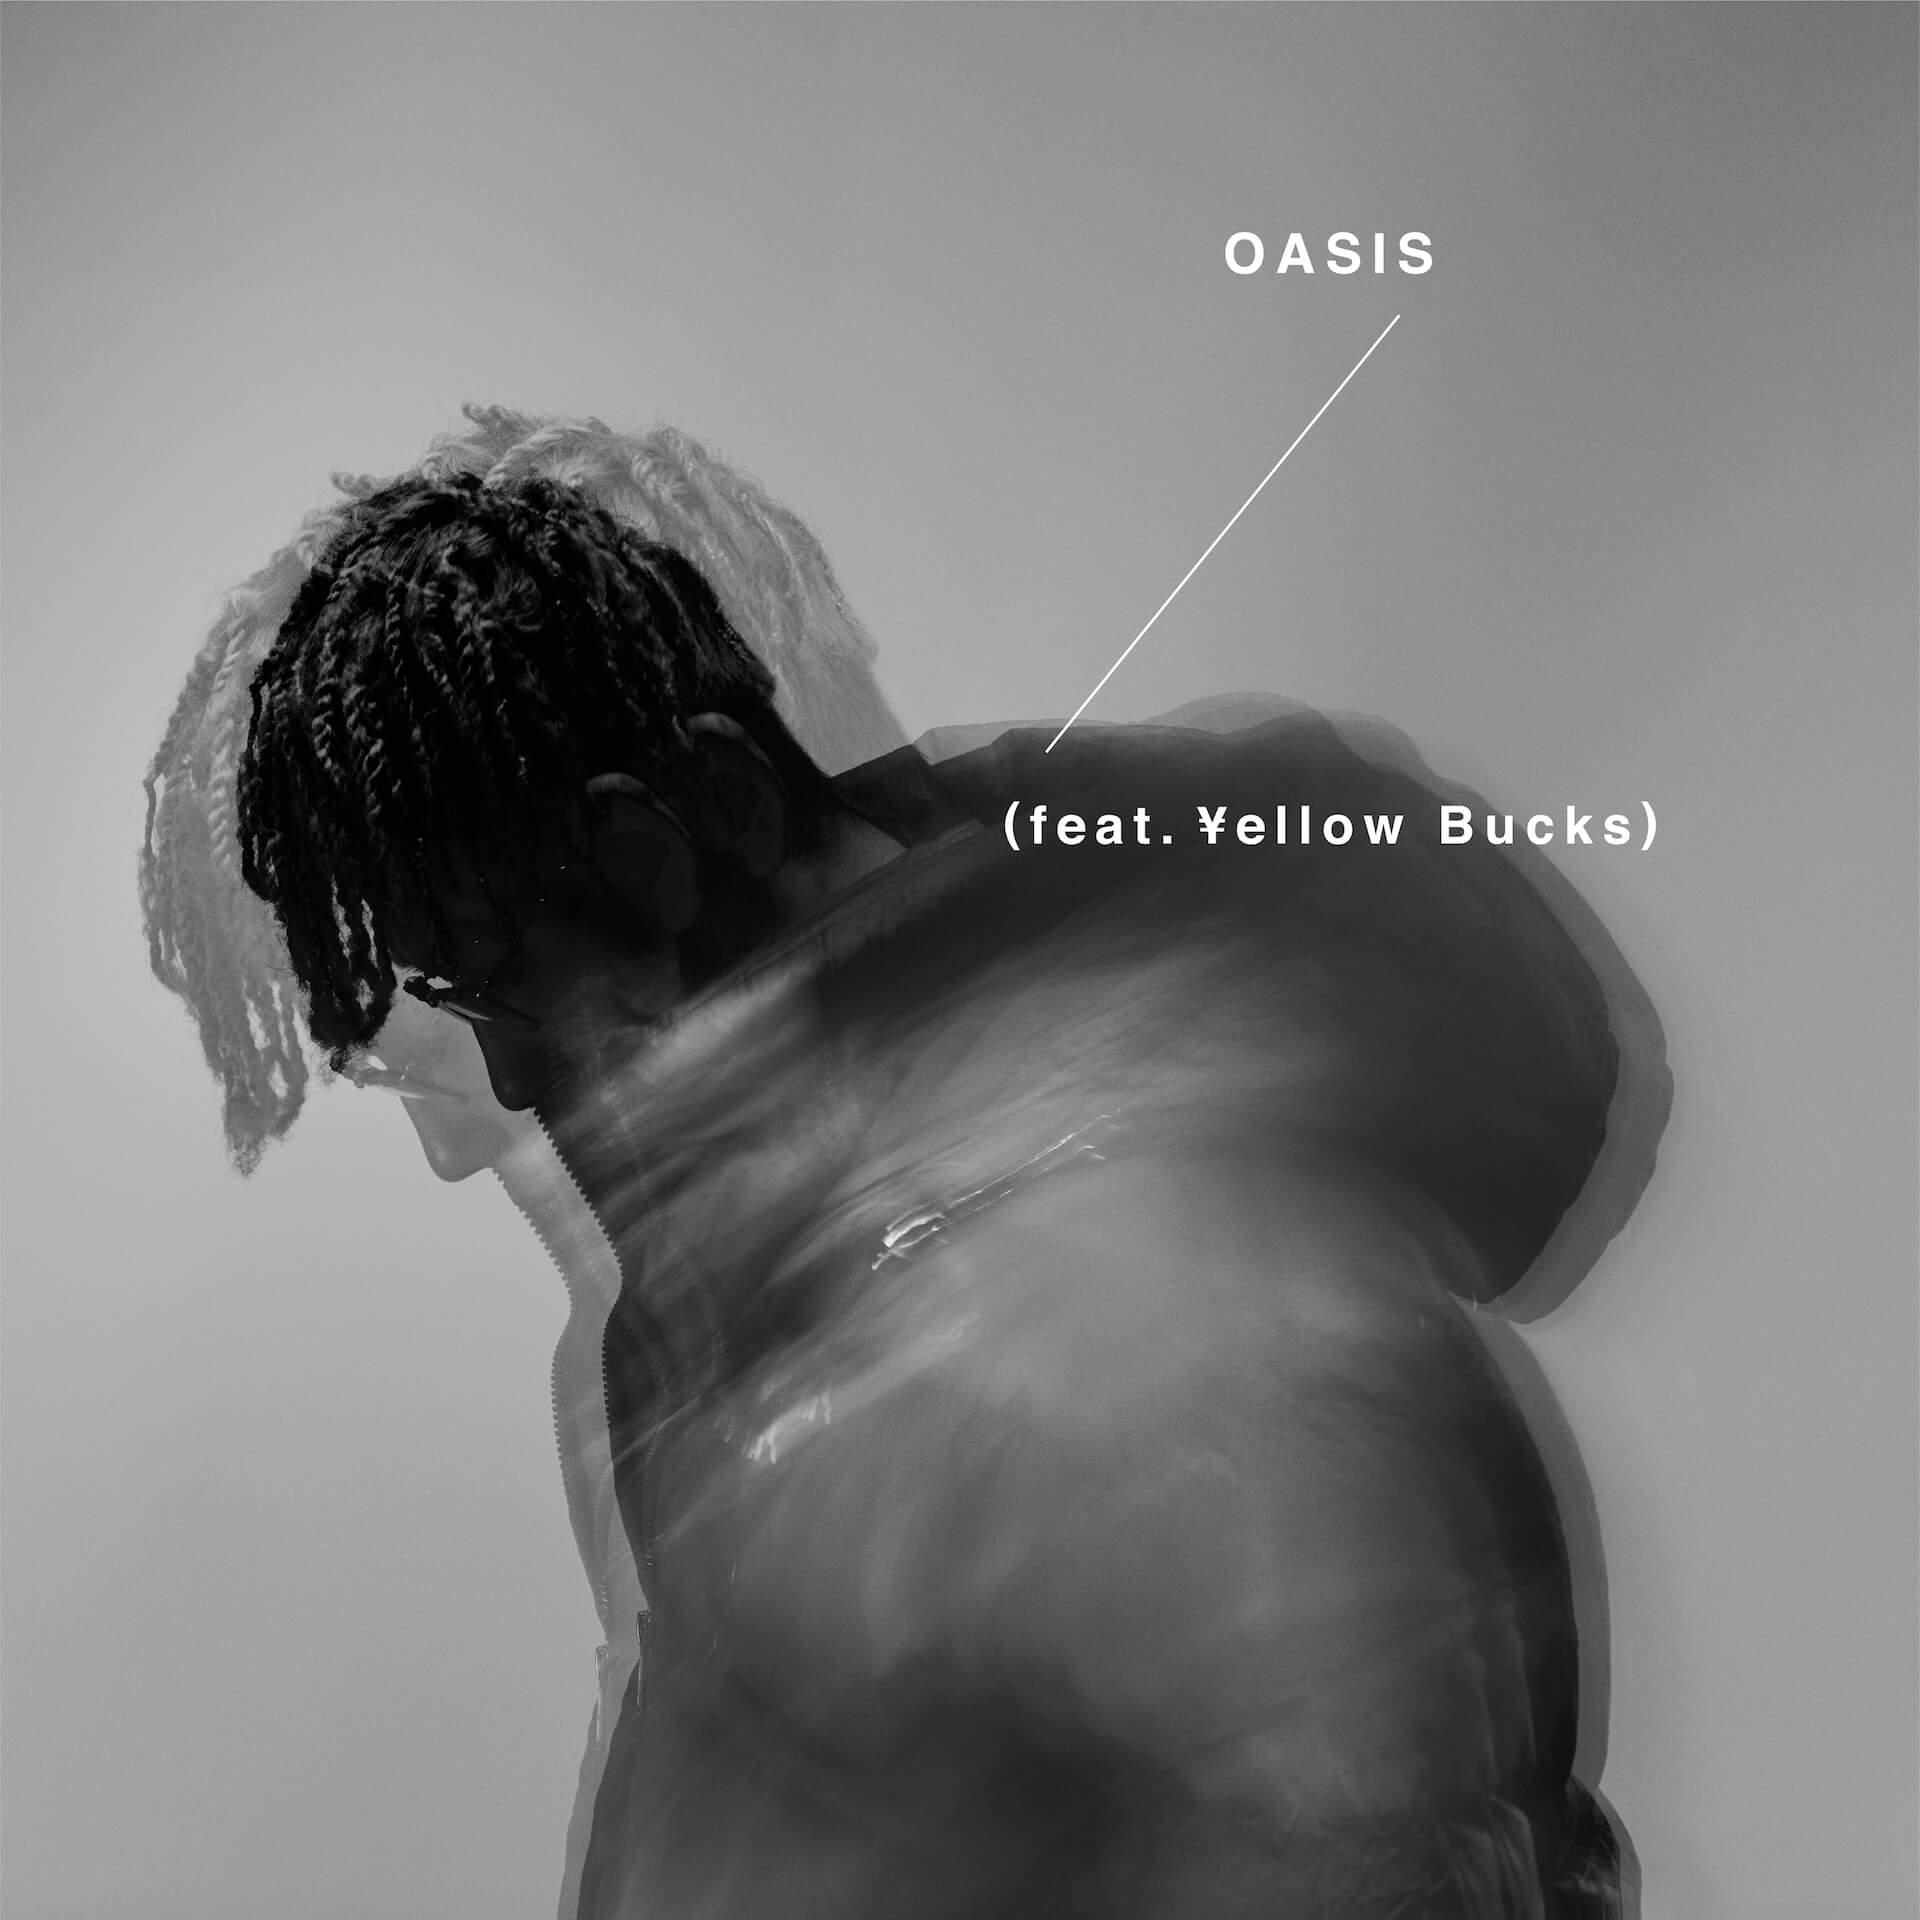 "Shurkn Papが¥ellow Bucksをフィーチャーした楽曲""OASIS ""が本日配信リリース!MVも公開 music210528_shurknpap_1"